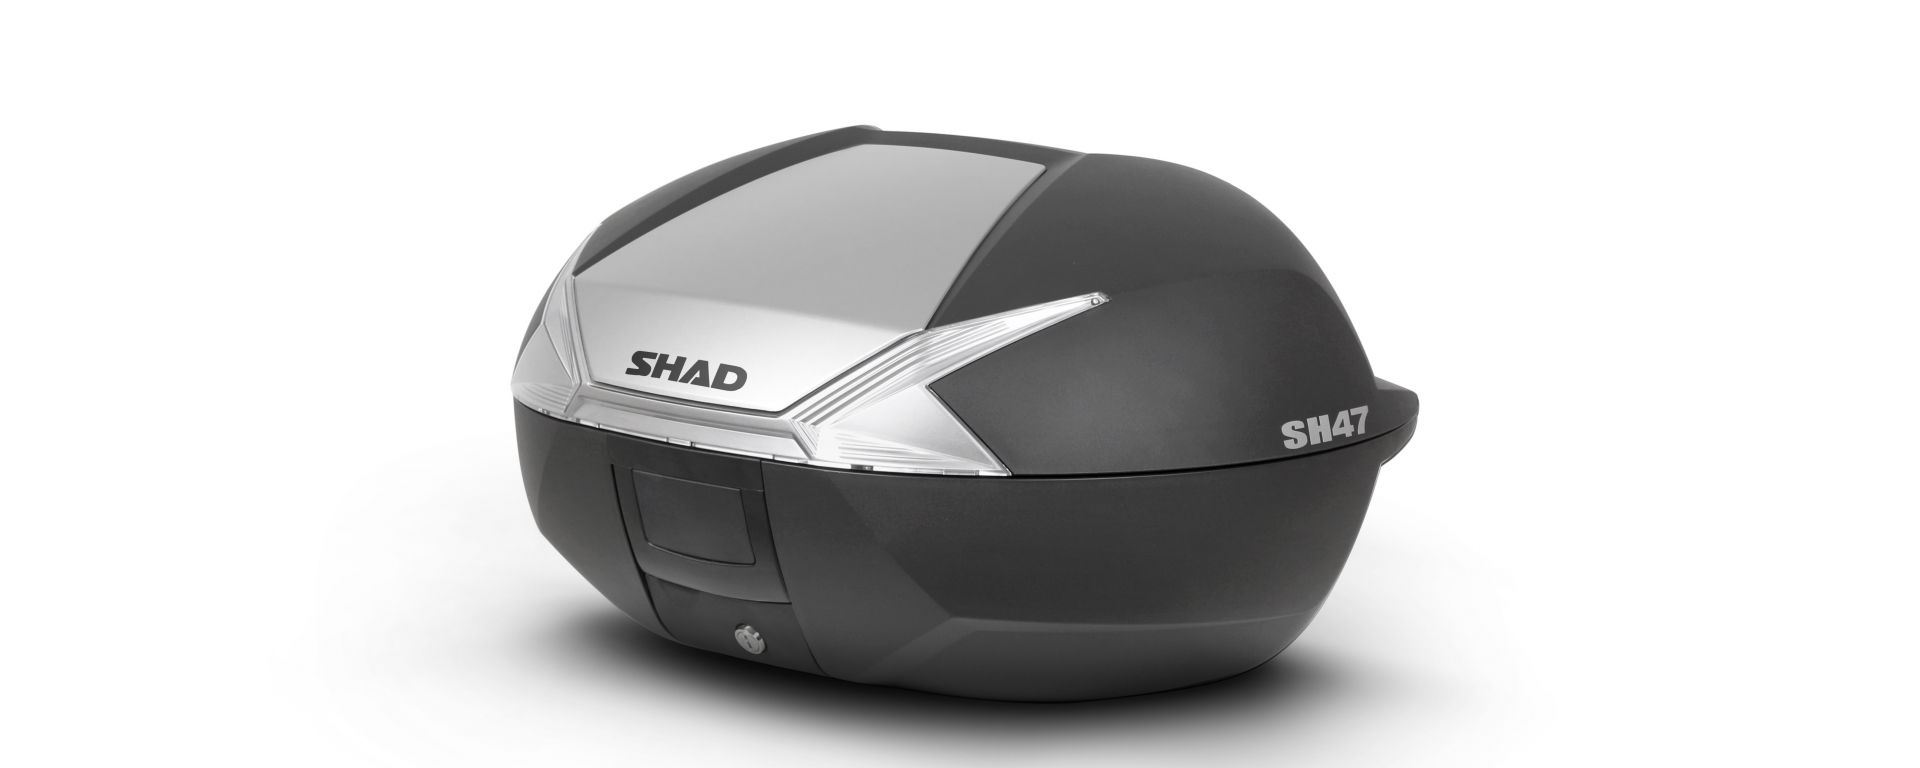 Shad SH47